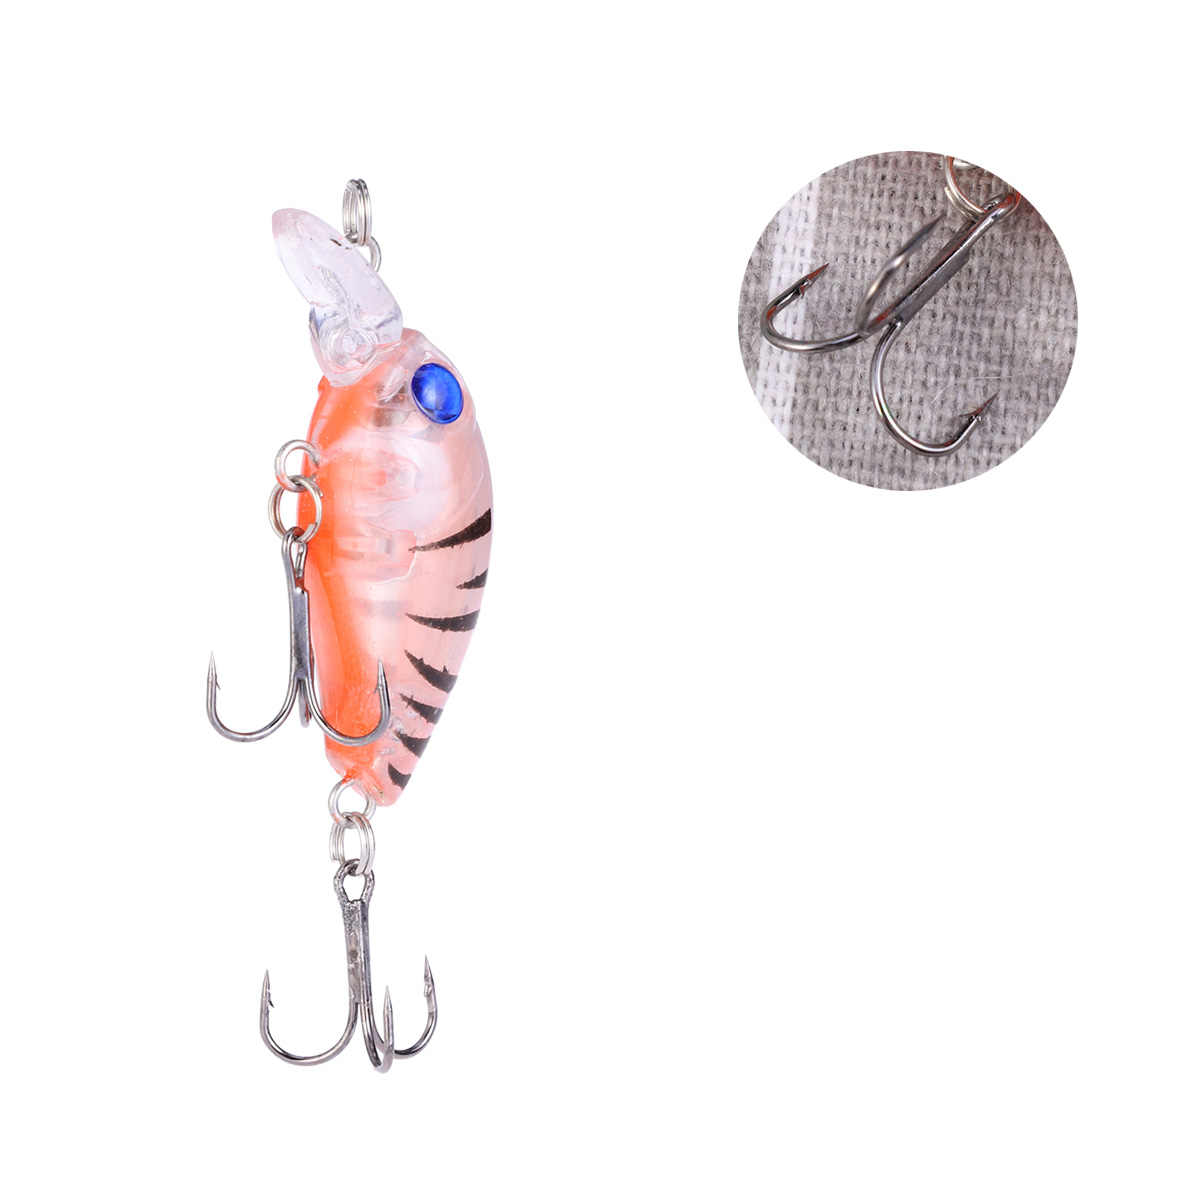 Señuelo de pesca duro de plástico realista, señuelo duro flotante, señuelo de pesca, cebo duro de roca para agua salada